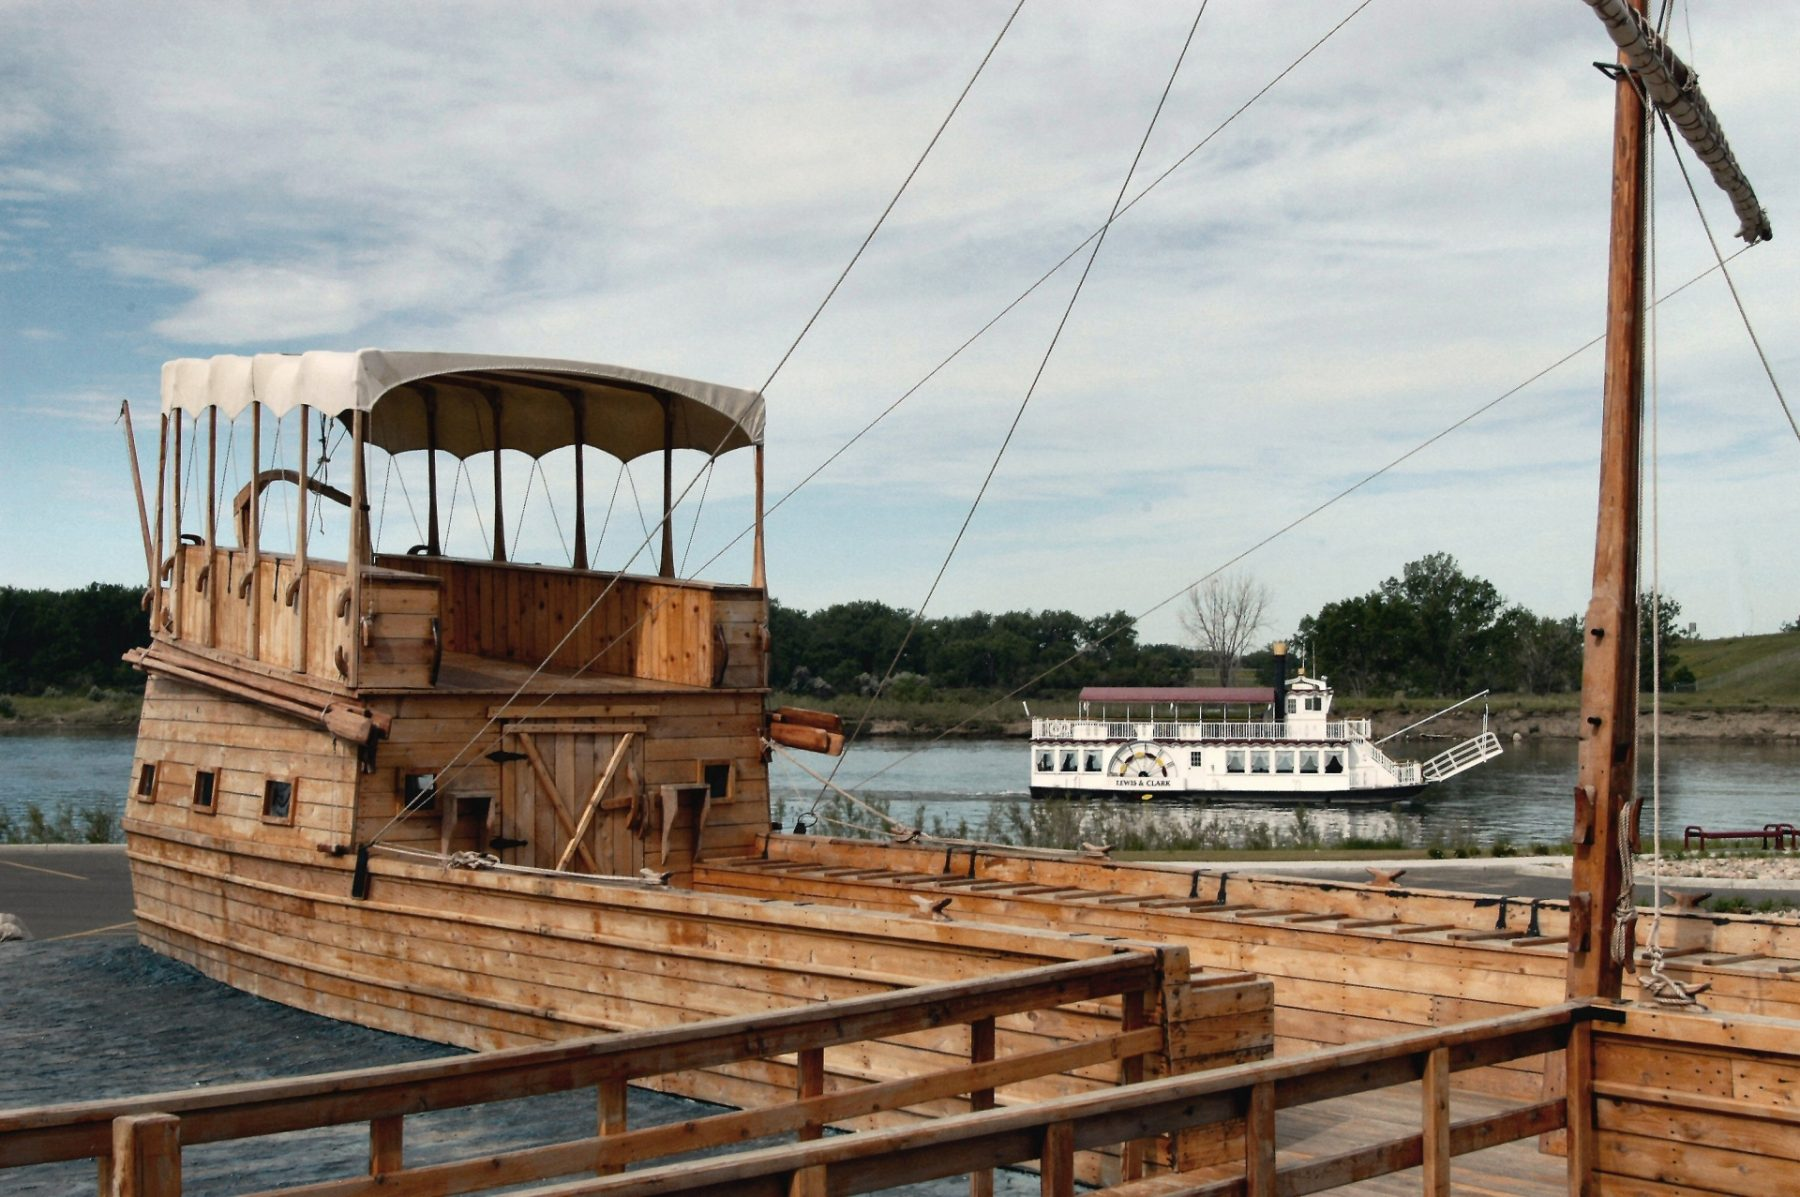 Cosa fare e vedere a Bismarck: Keelboat Park